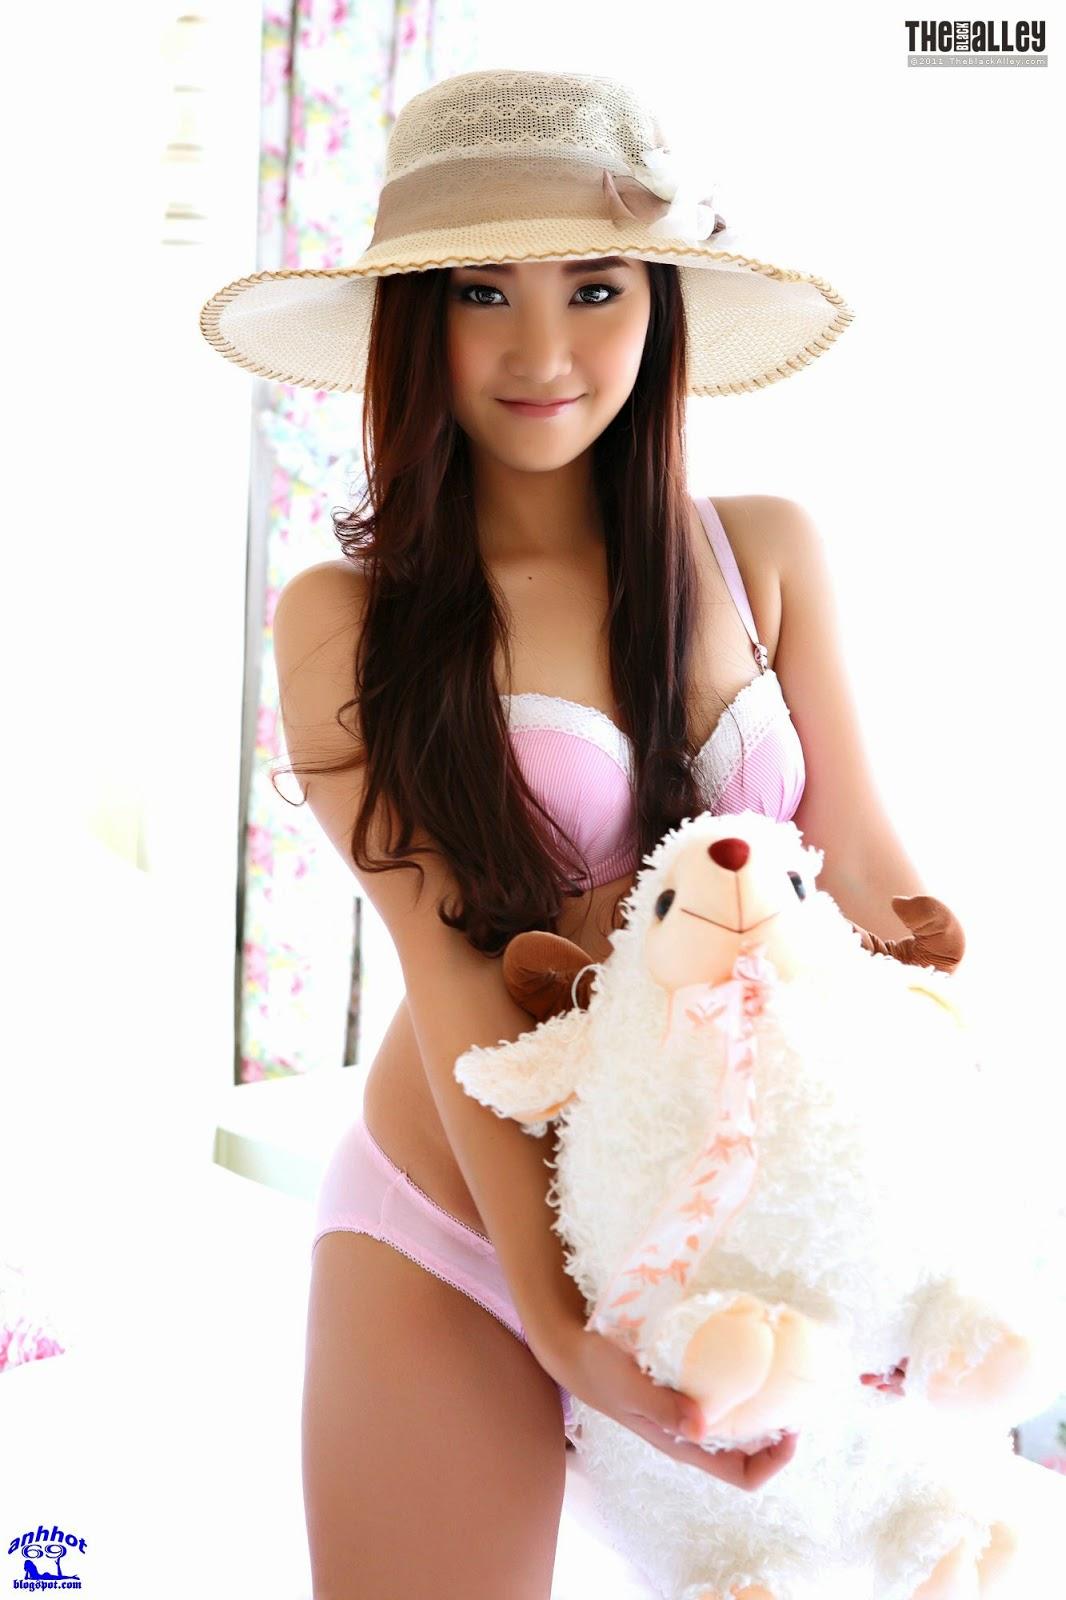 lolita-cheng-64-001